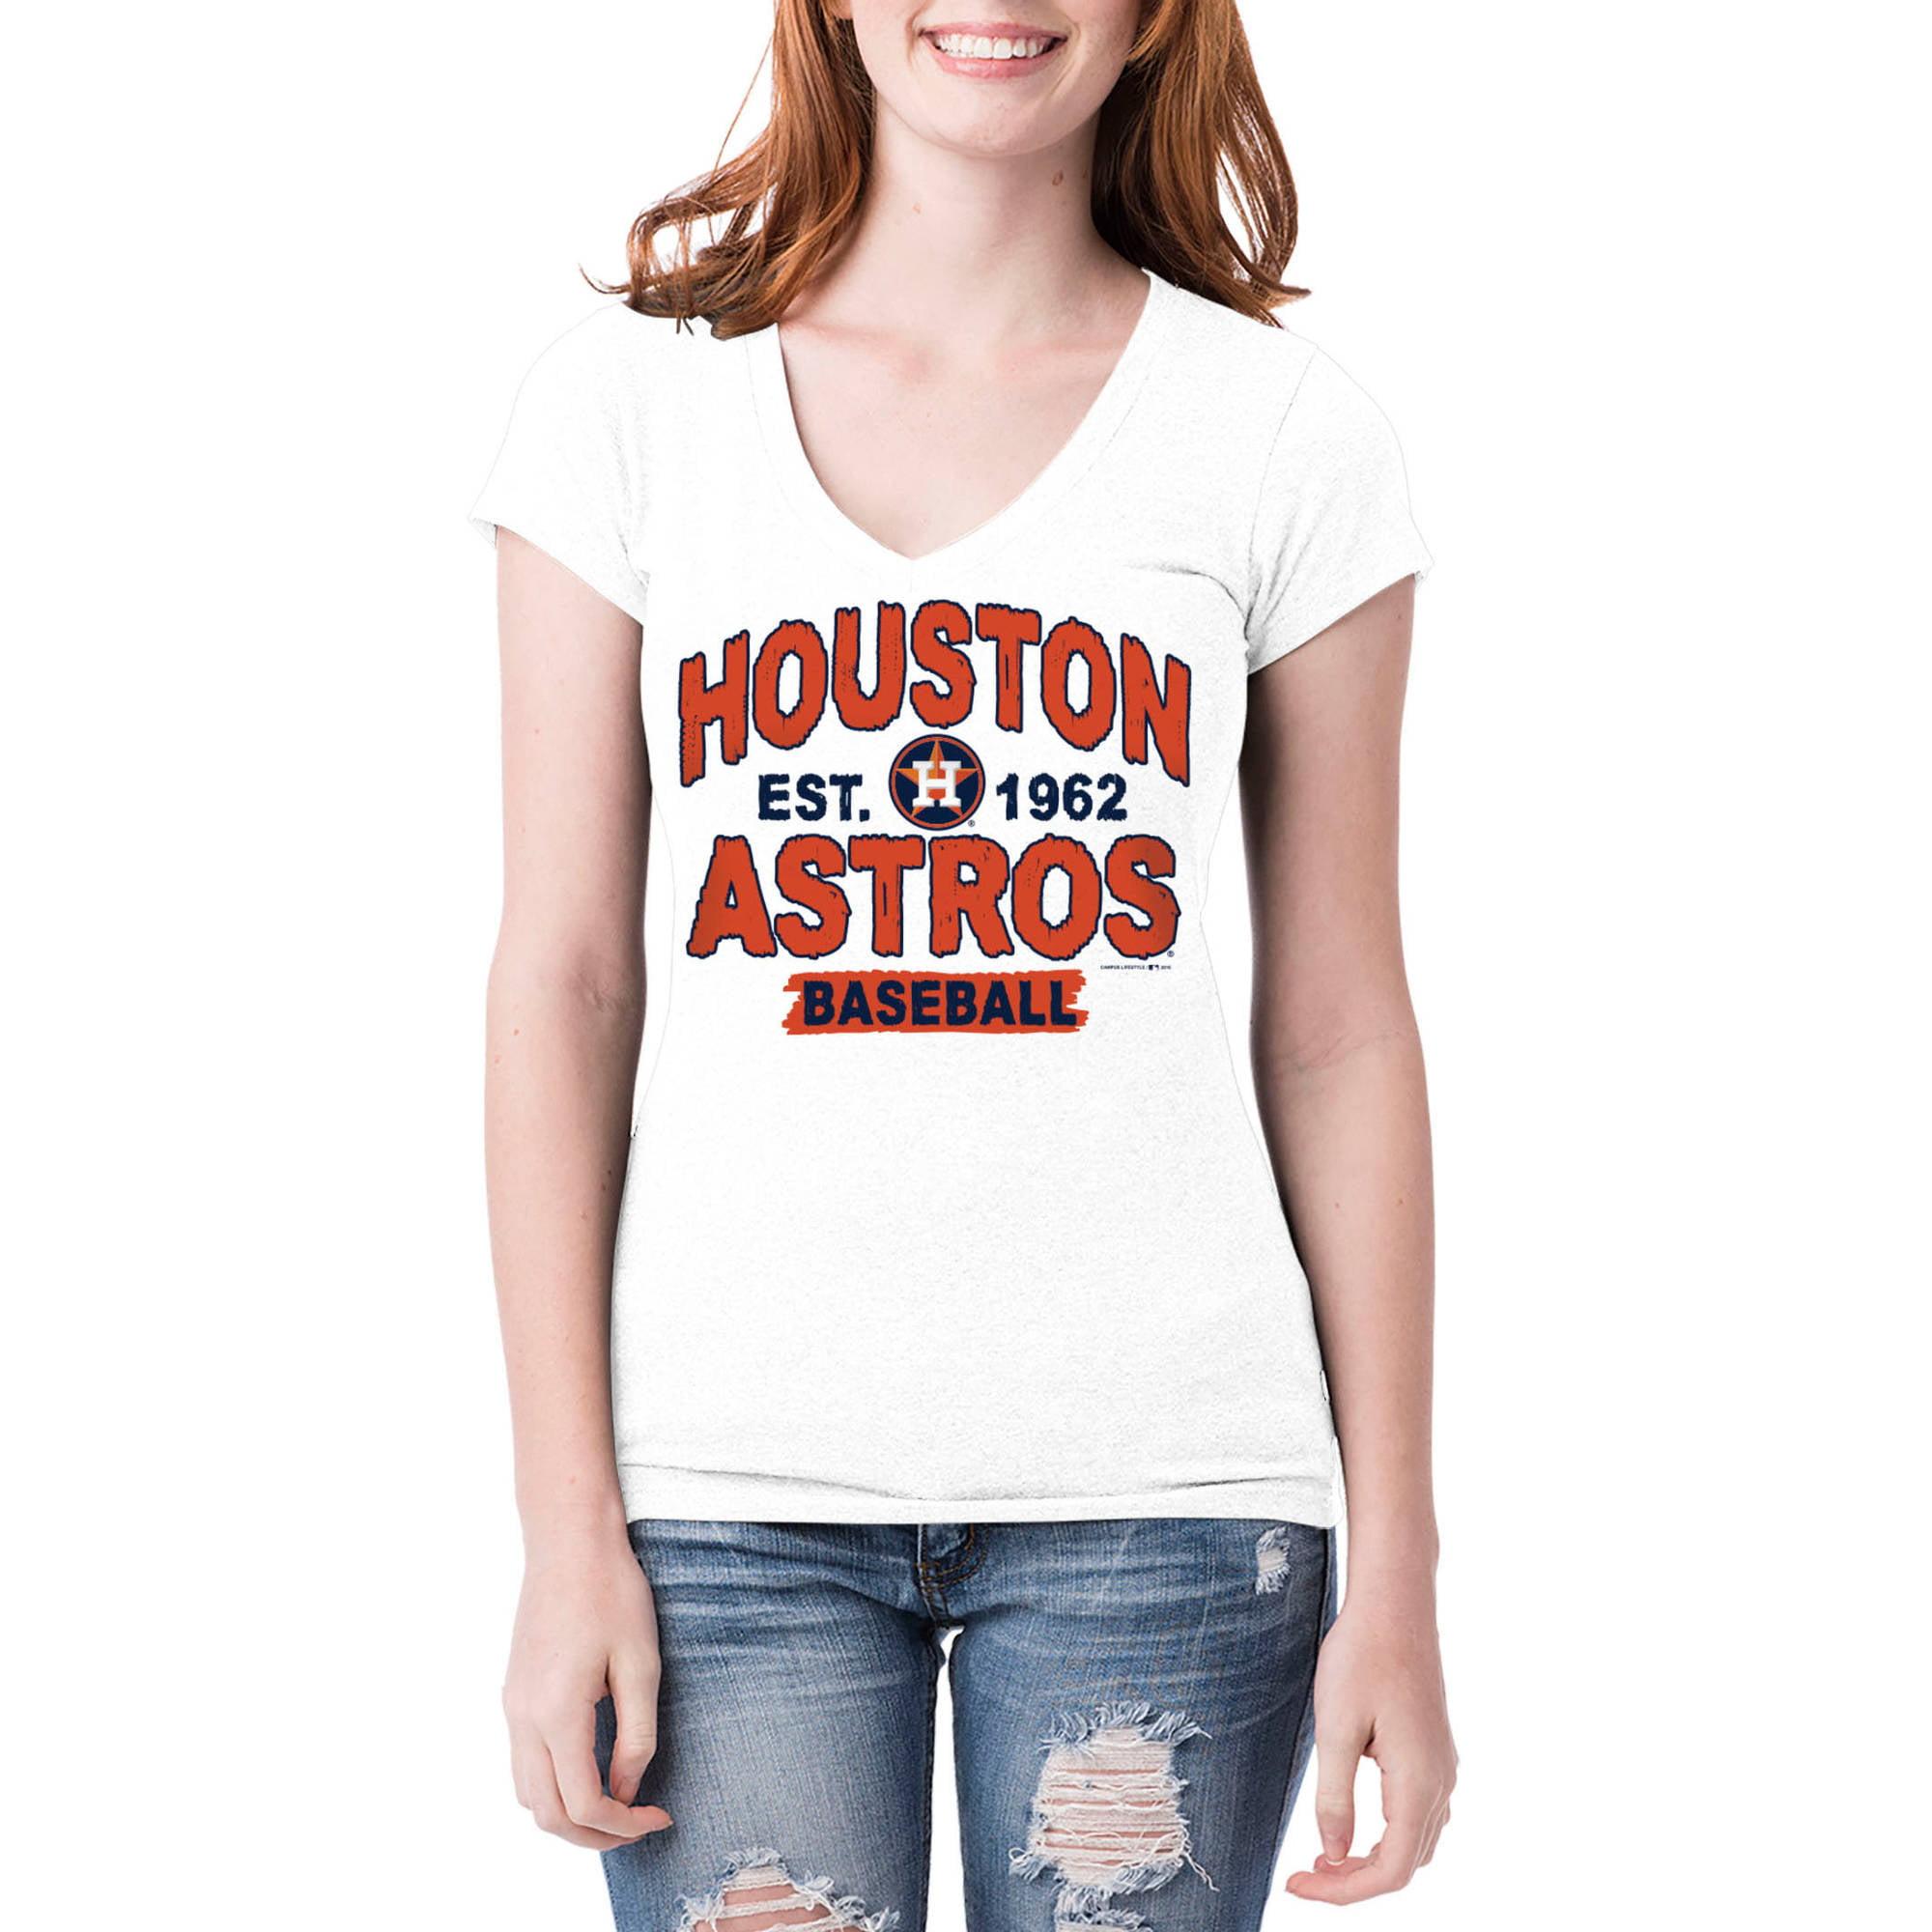 Houston Astros Womens Short Sleeve White Graphic Tee